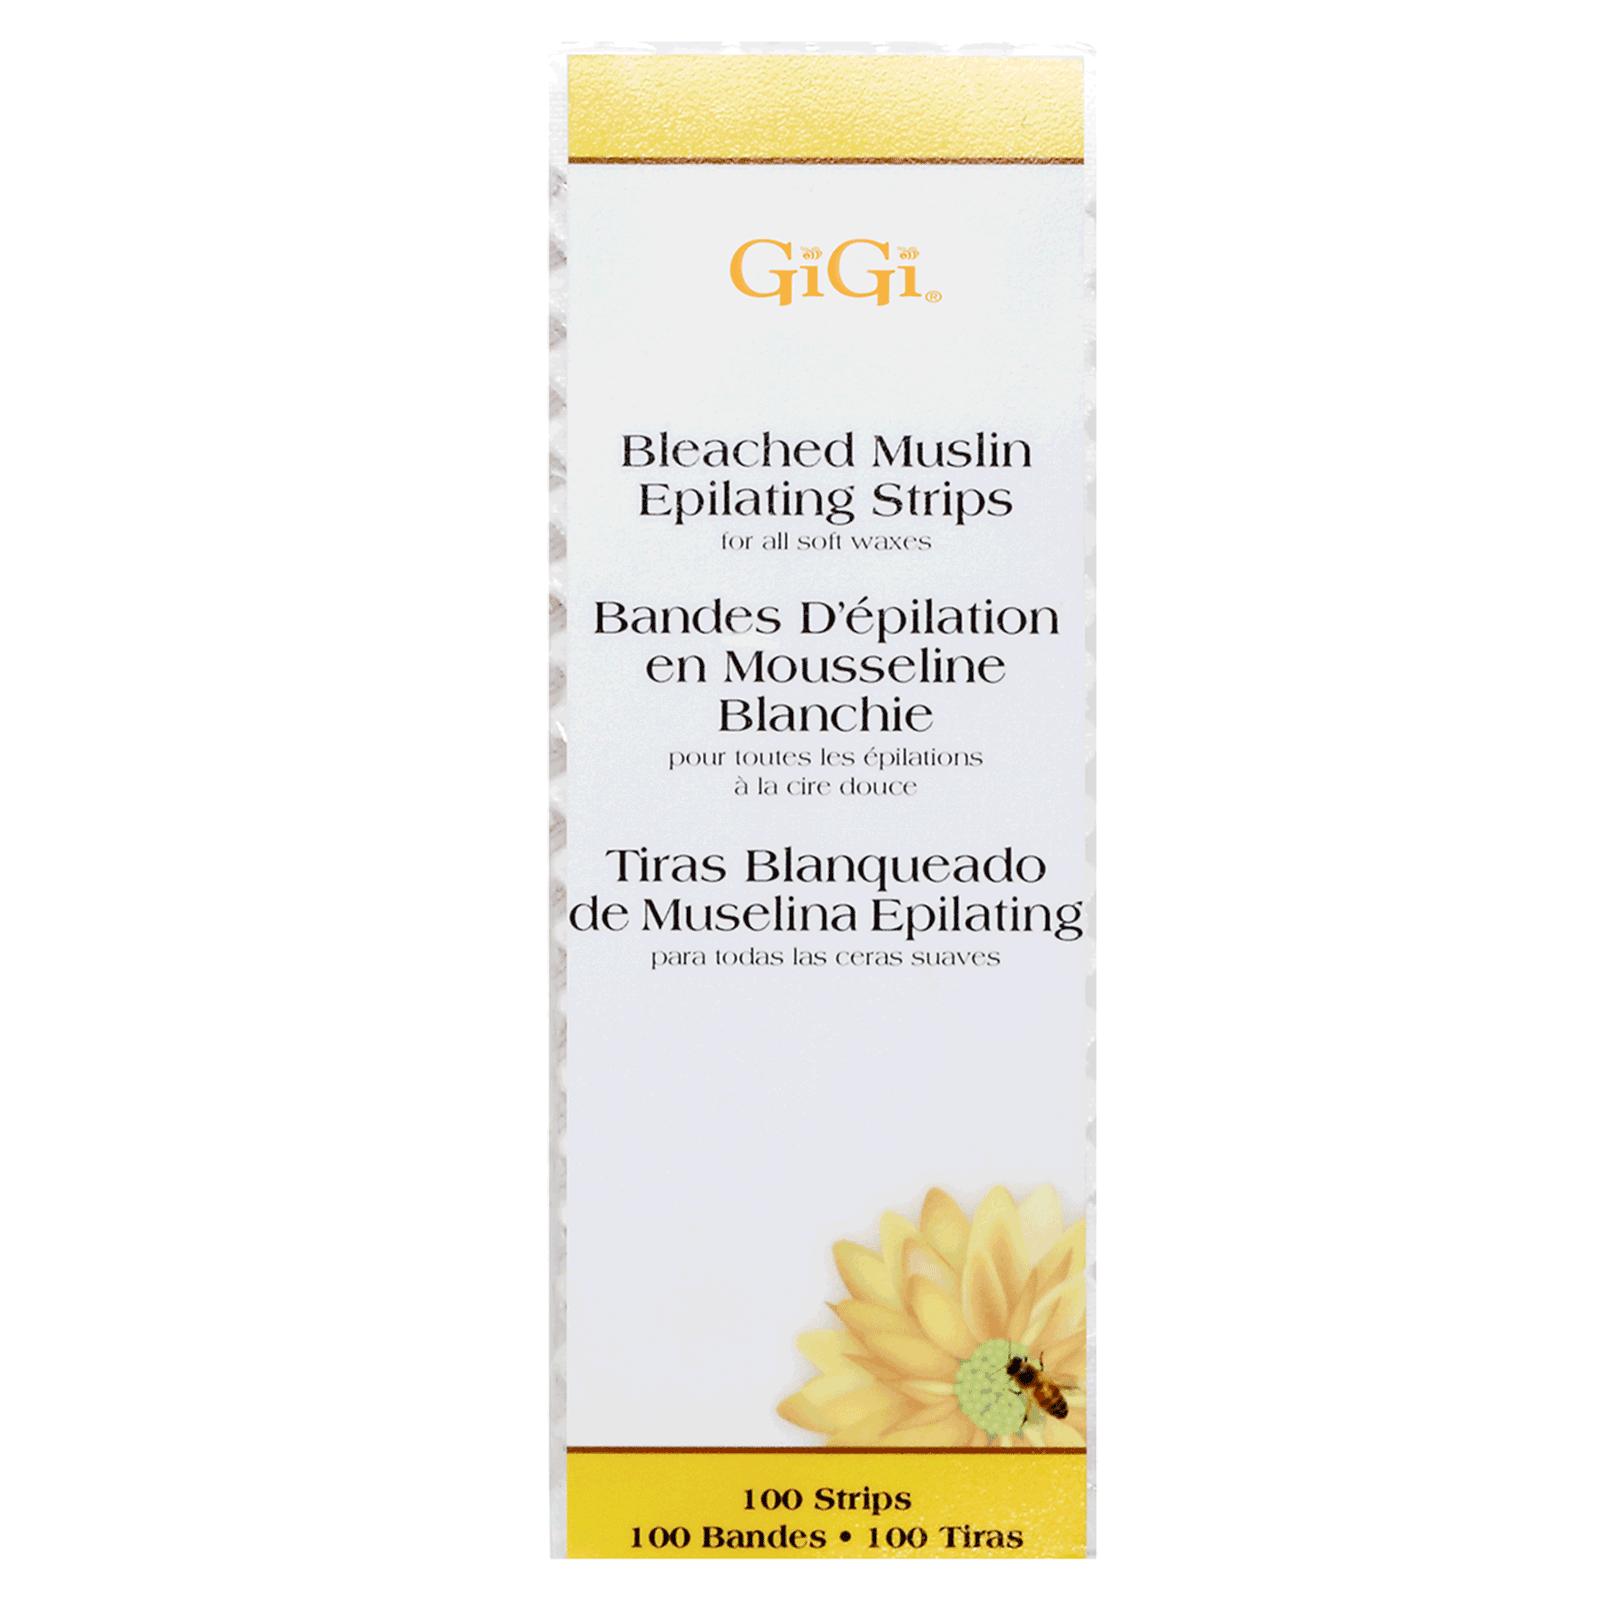 gigi honee wax instructions